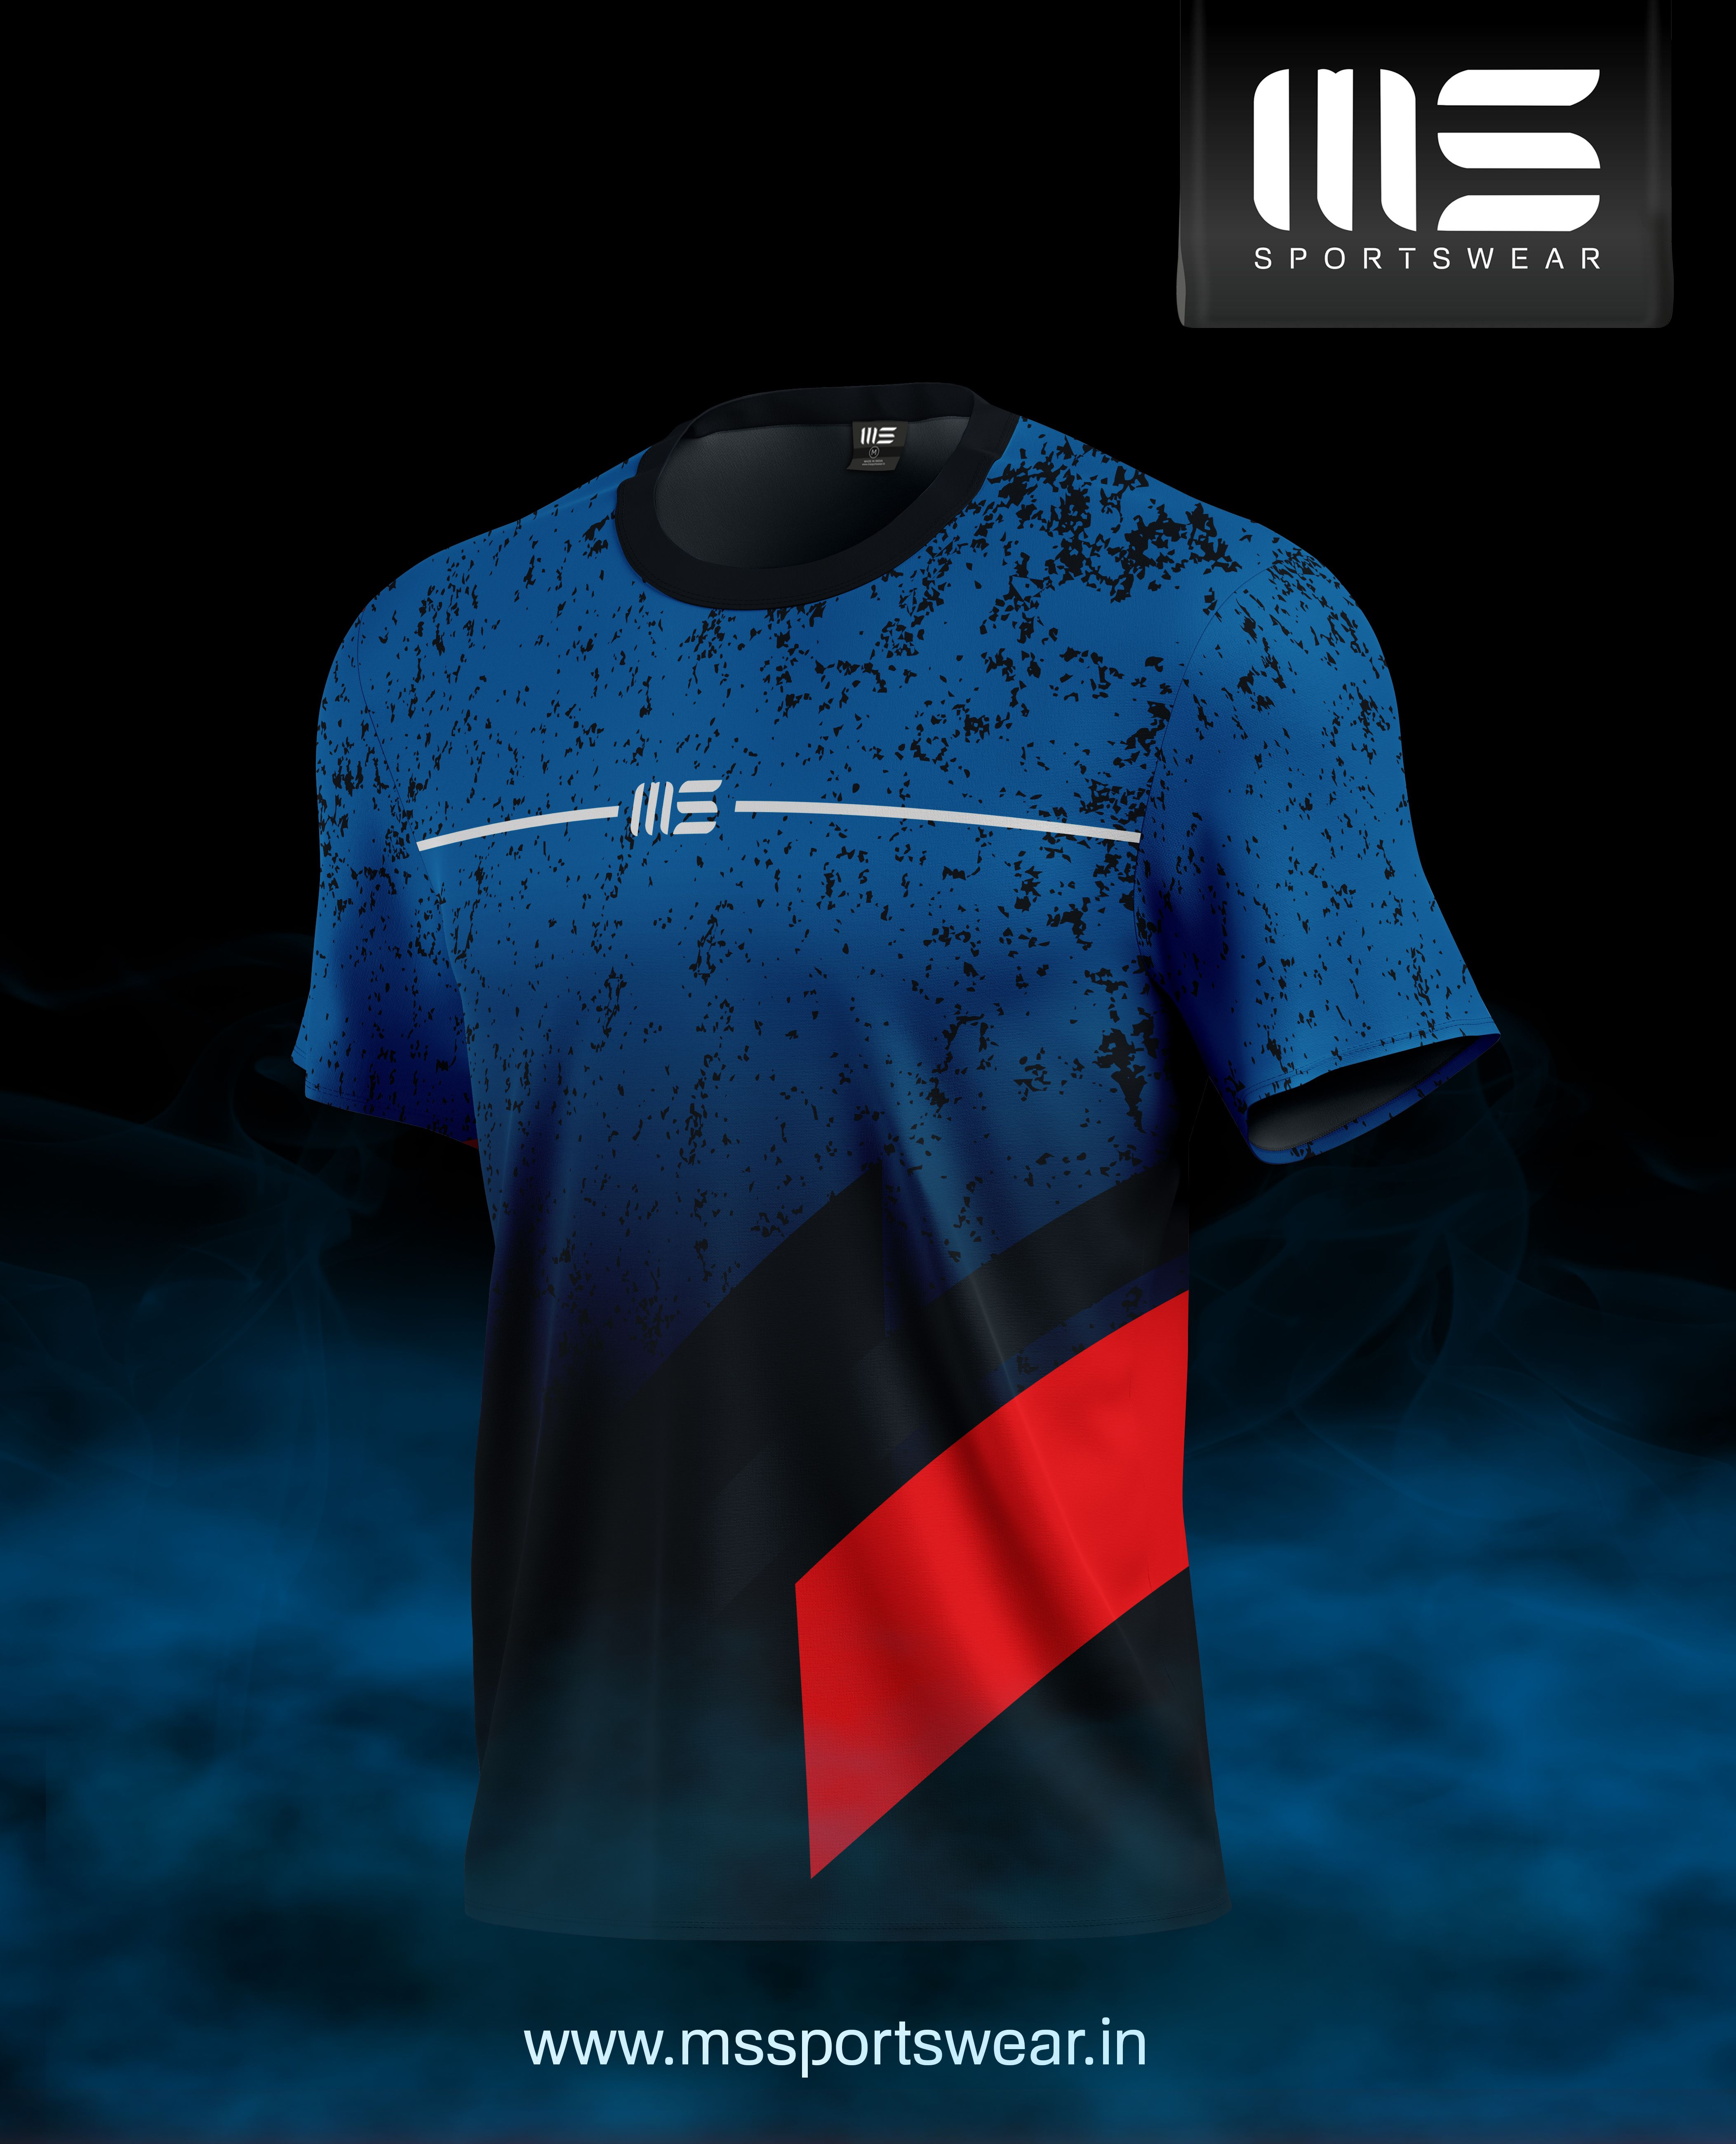 MS SPORTSWEAR   Sports tshirt designs, Sport shirt design, Sports ...